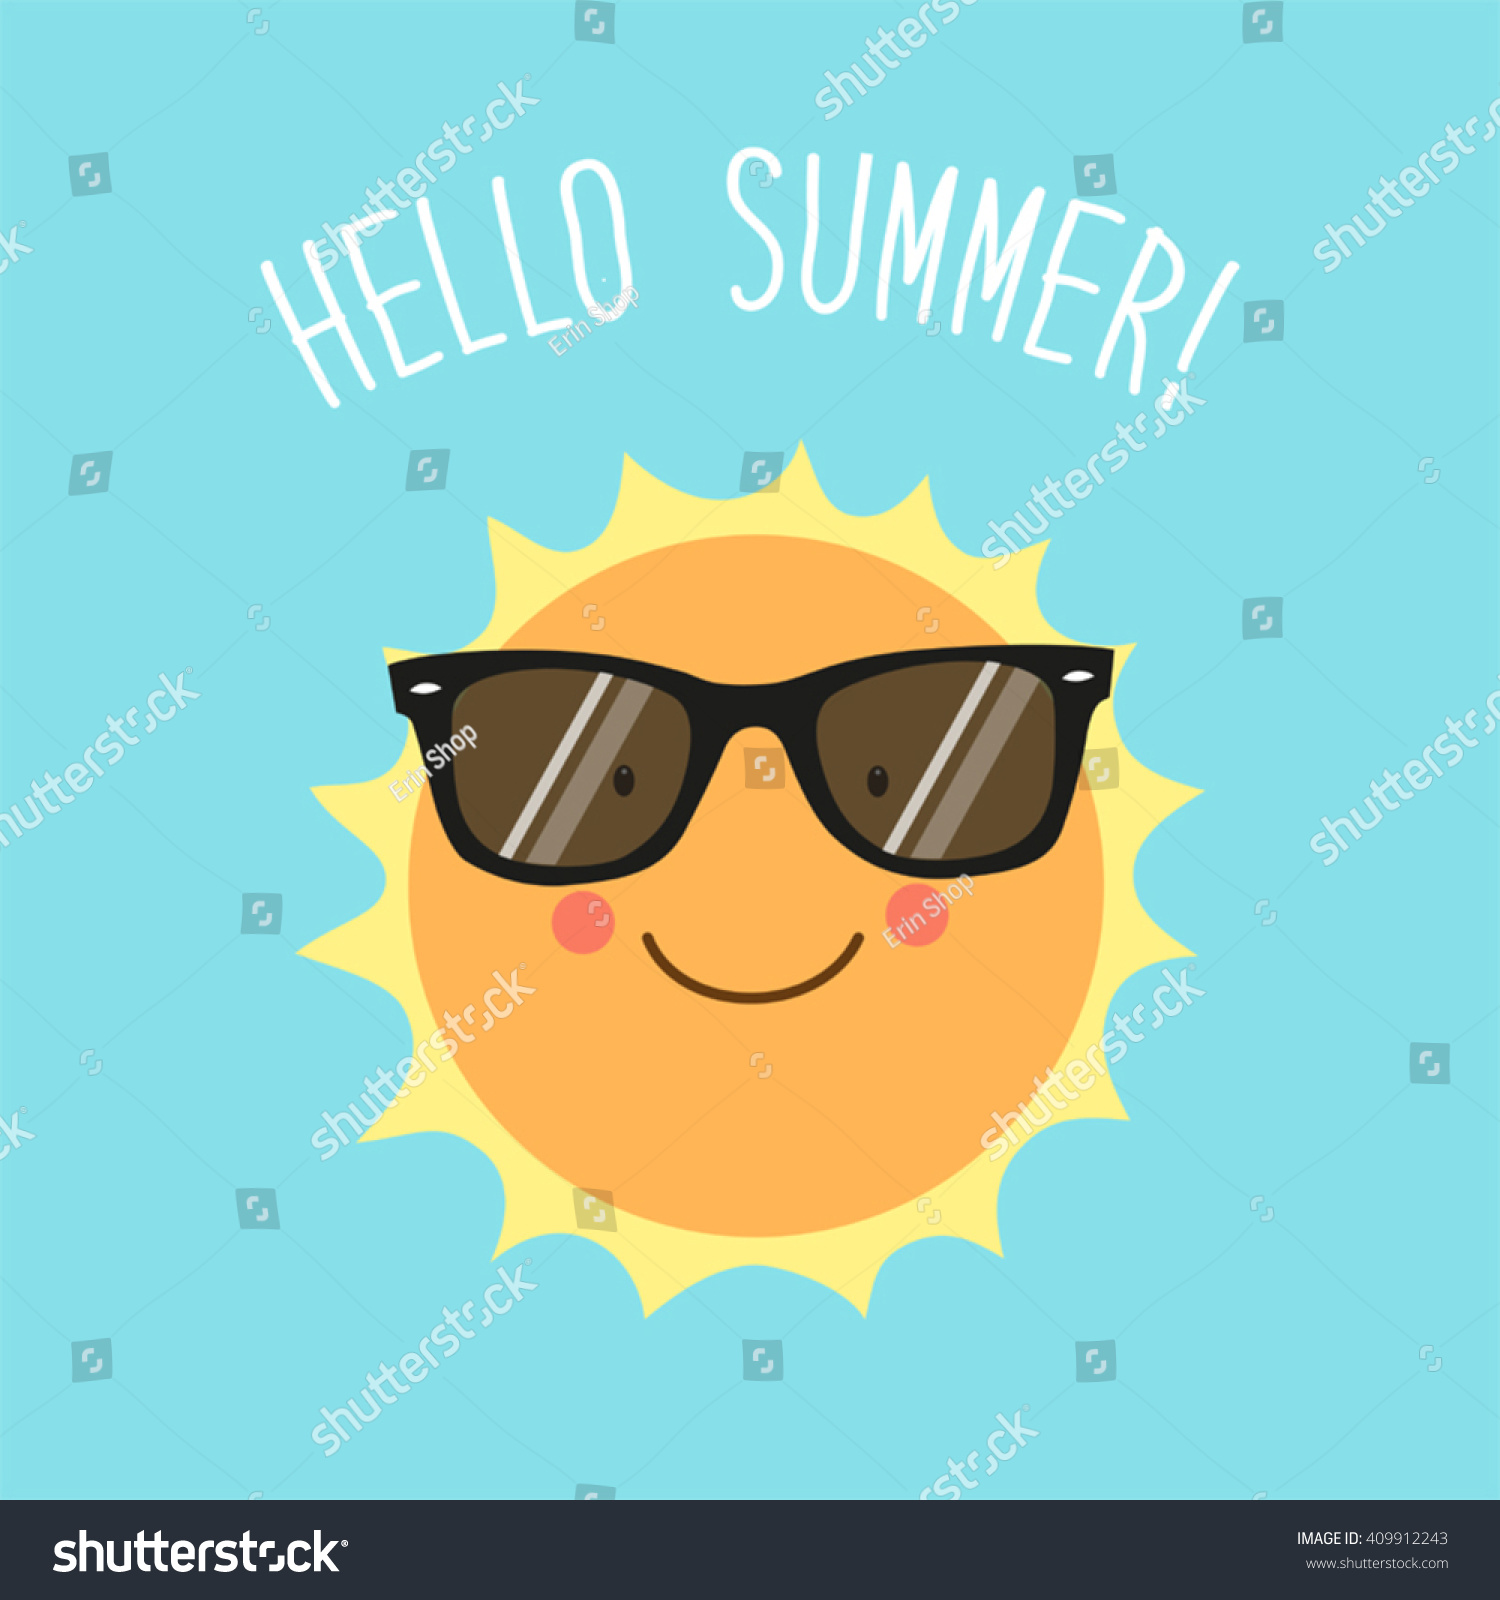 Hello Summer Card Cute Hand Drawn Stock Vector 409912243 - Shutterstock